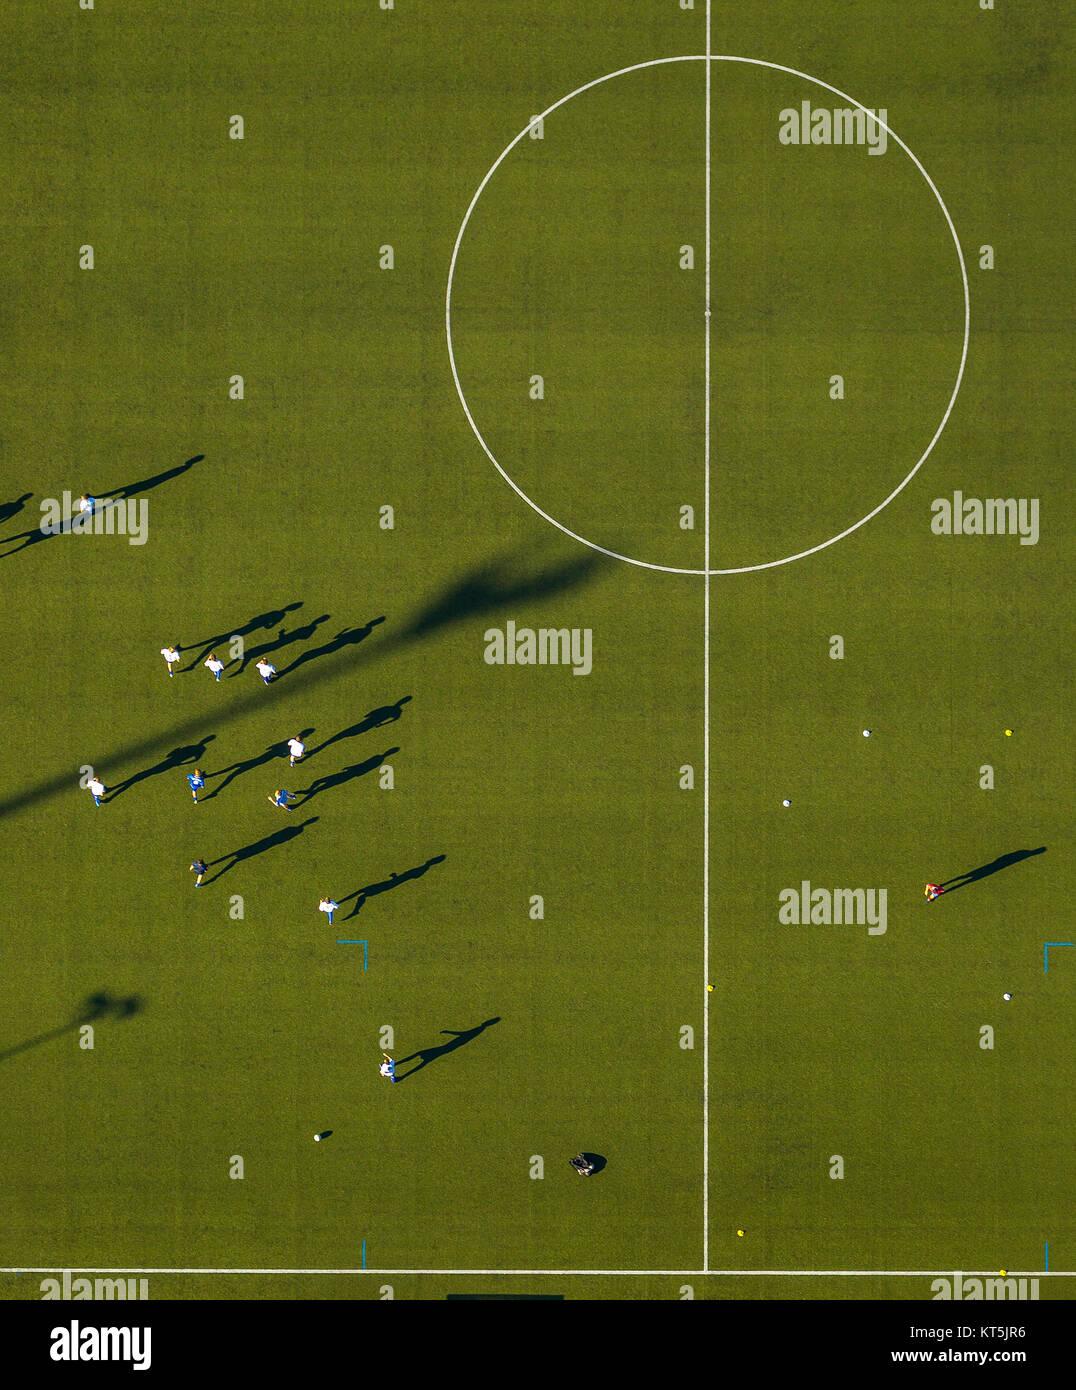 Gustav Hoffmann Stadium, football training green grass field. Center circle, soccer field, Kleve, Niederrhein, North - Stock Image